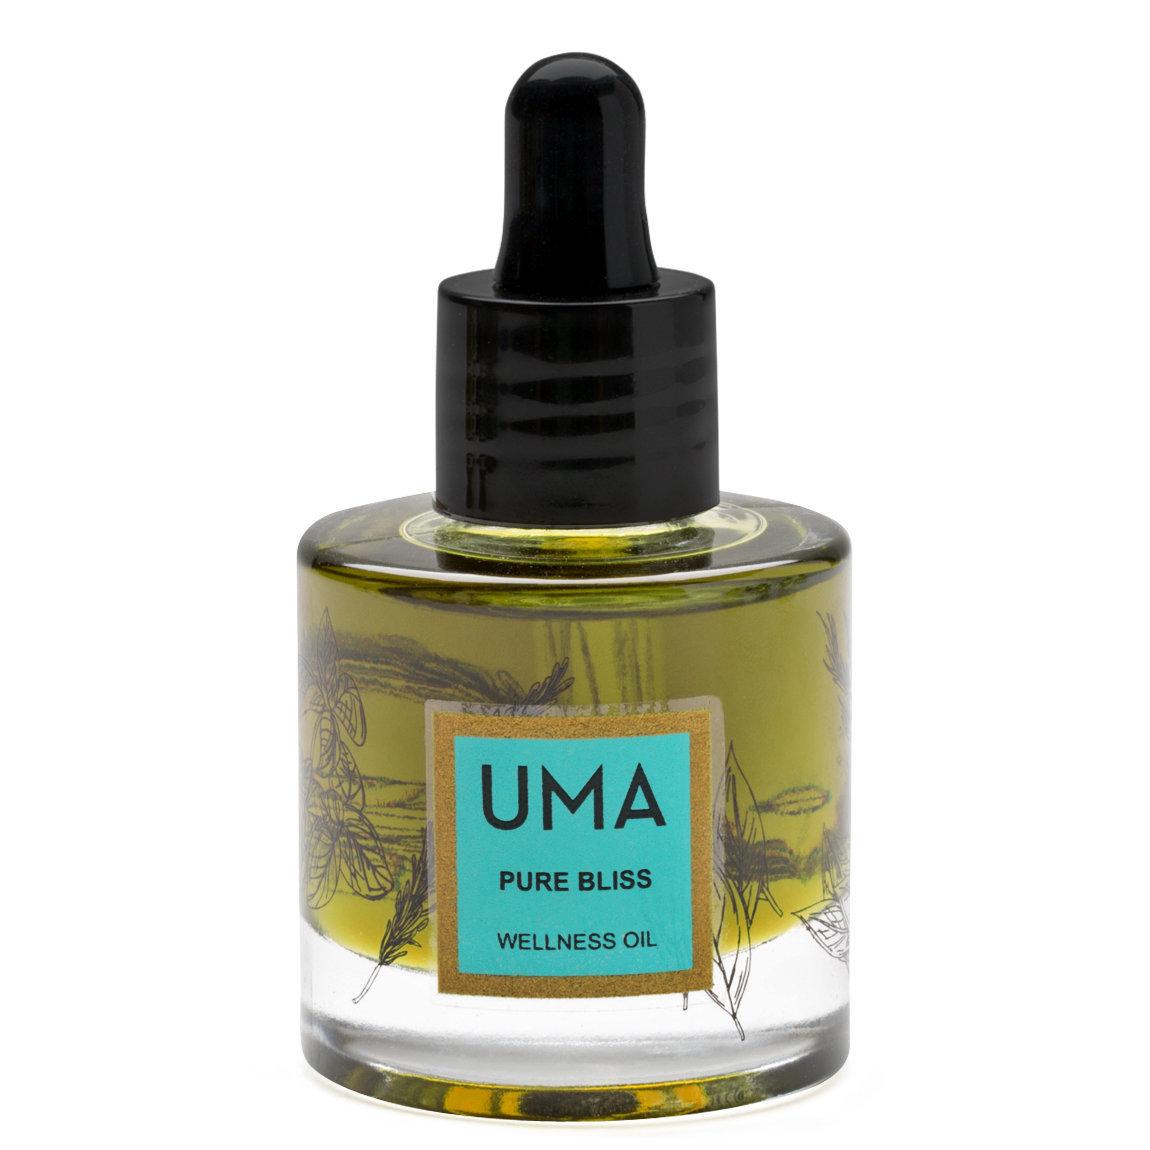 Uma Pure Bliss Wellness Oil 1 fl oz alternative view 1 - product swatch.